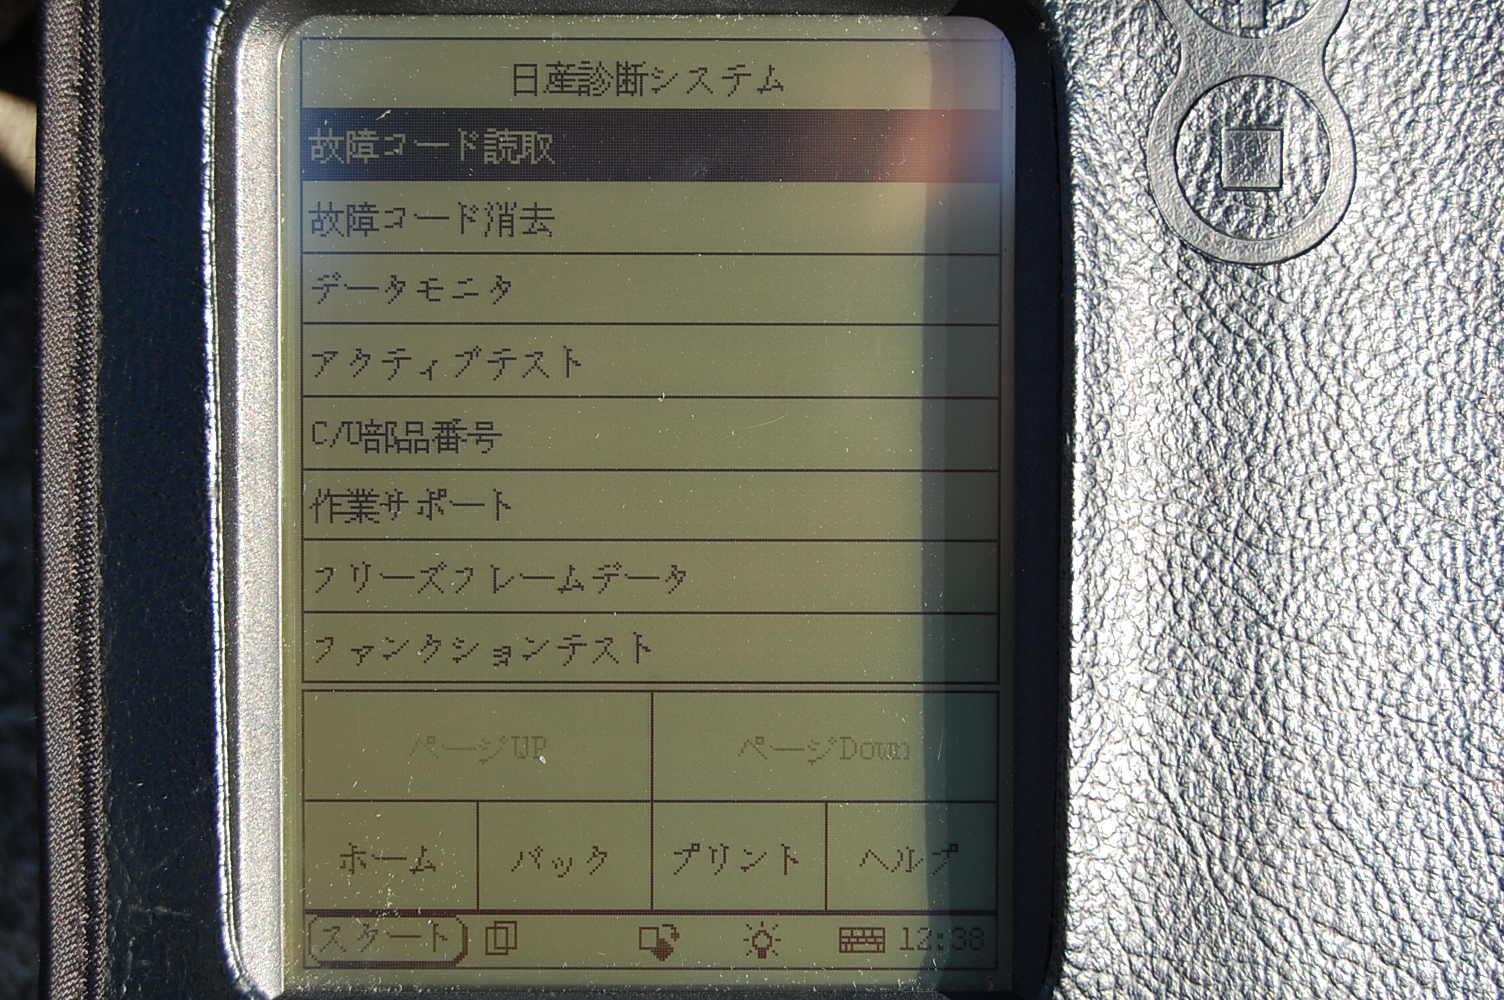 DSC_0002_2.jpg